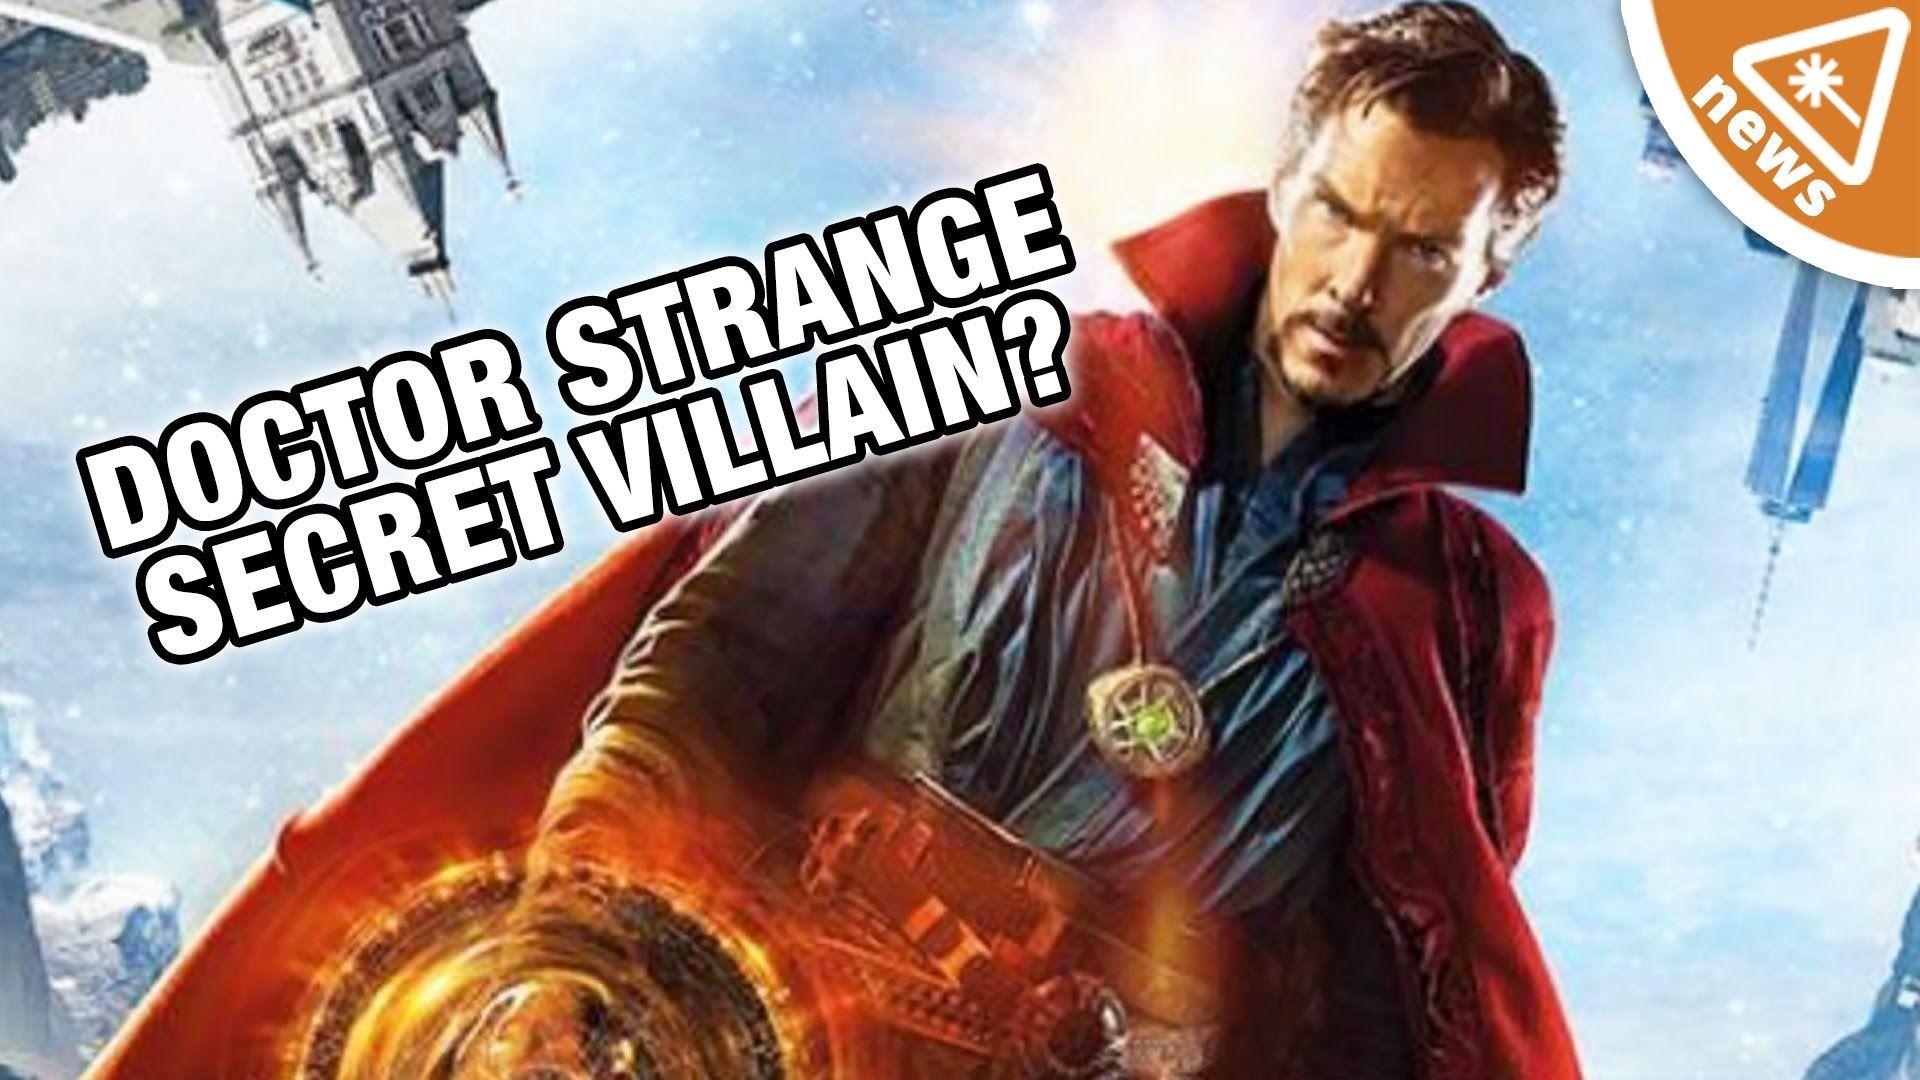 Res: 1920x1080, Who Is Marvel's Punisher Main Villain? (Nerdist News w/ Jessica Chobot) |  geek side | Pinterest | Jessica chobot, Punisher and Upcoming netflix series